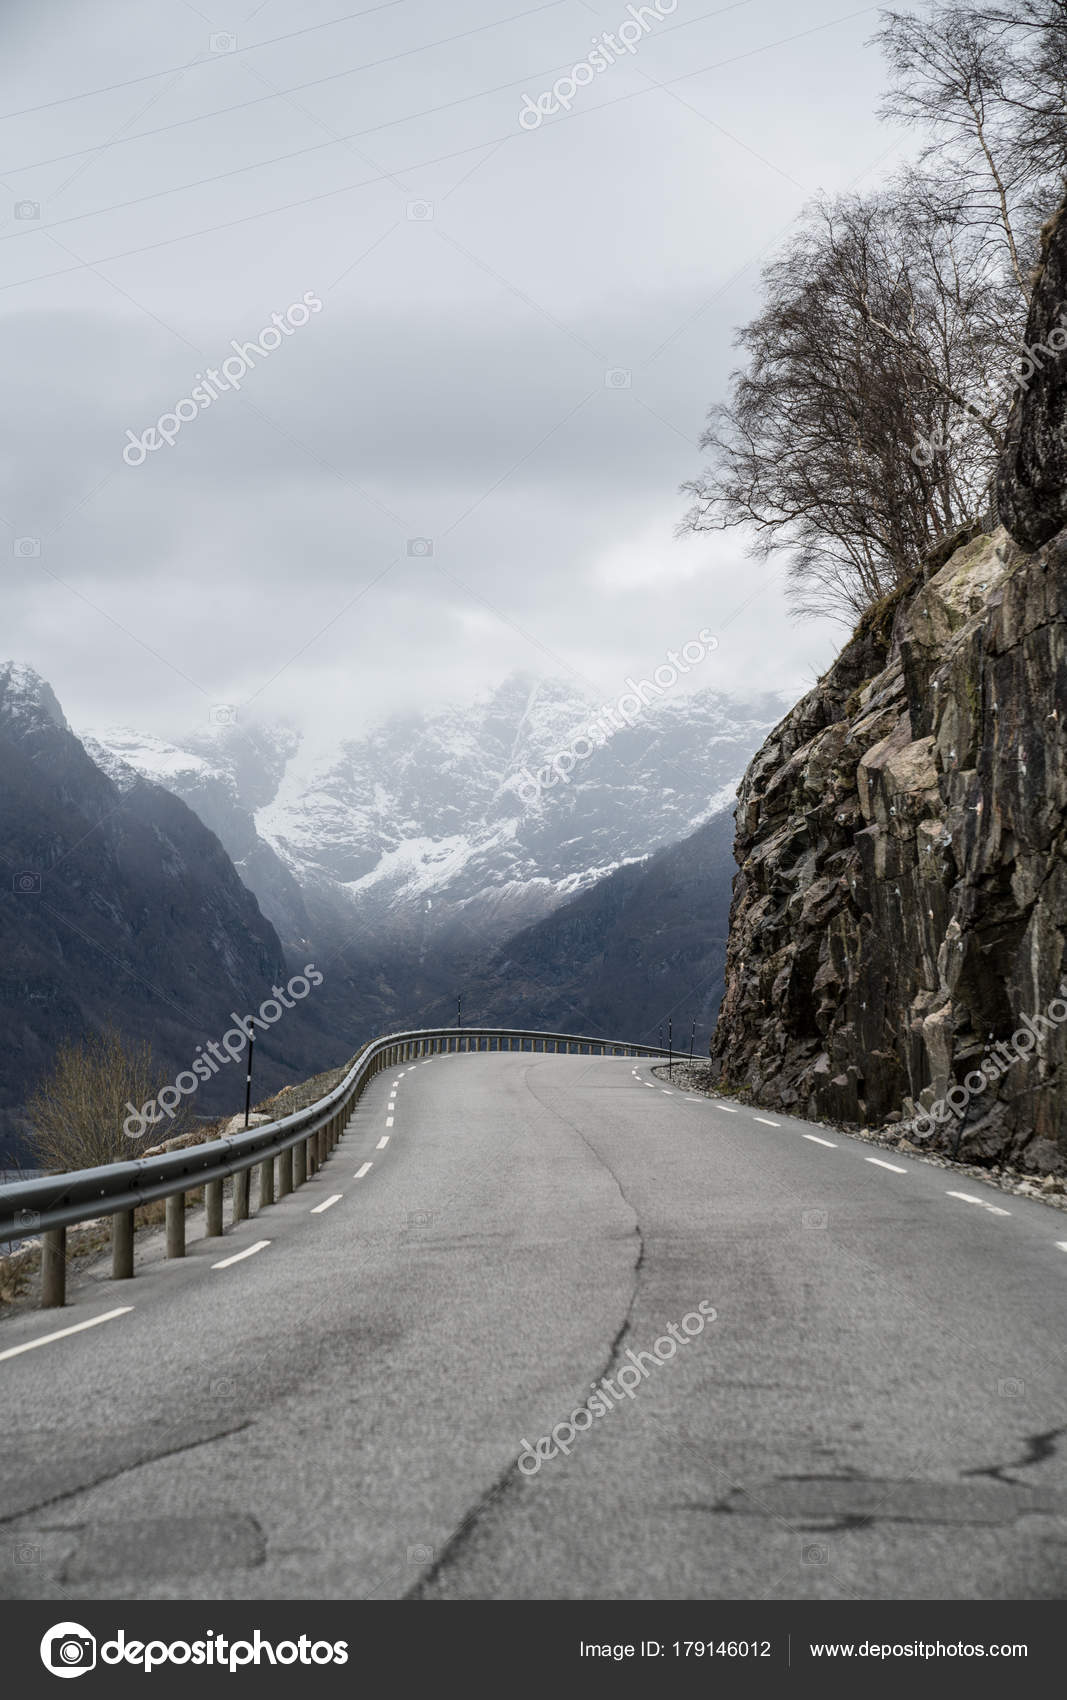 Roads in norway stock photo genlock1 179146012 roads in norway stock photo publicscrutiny Images